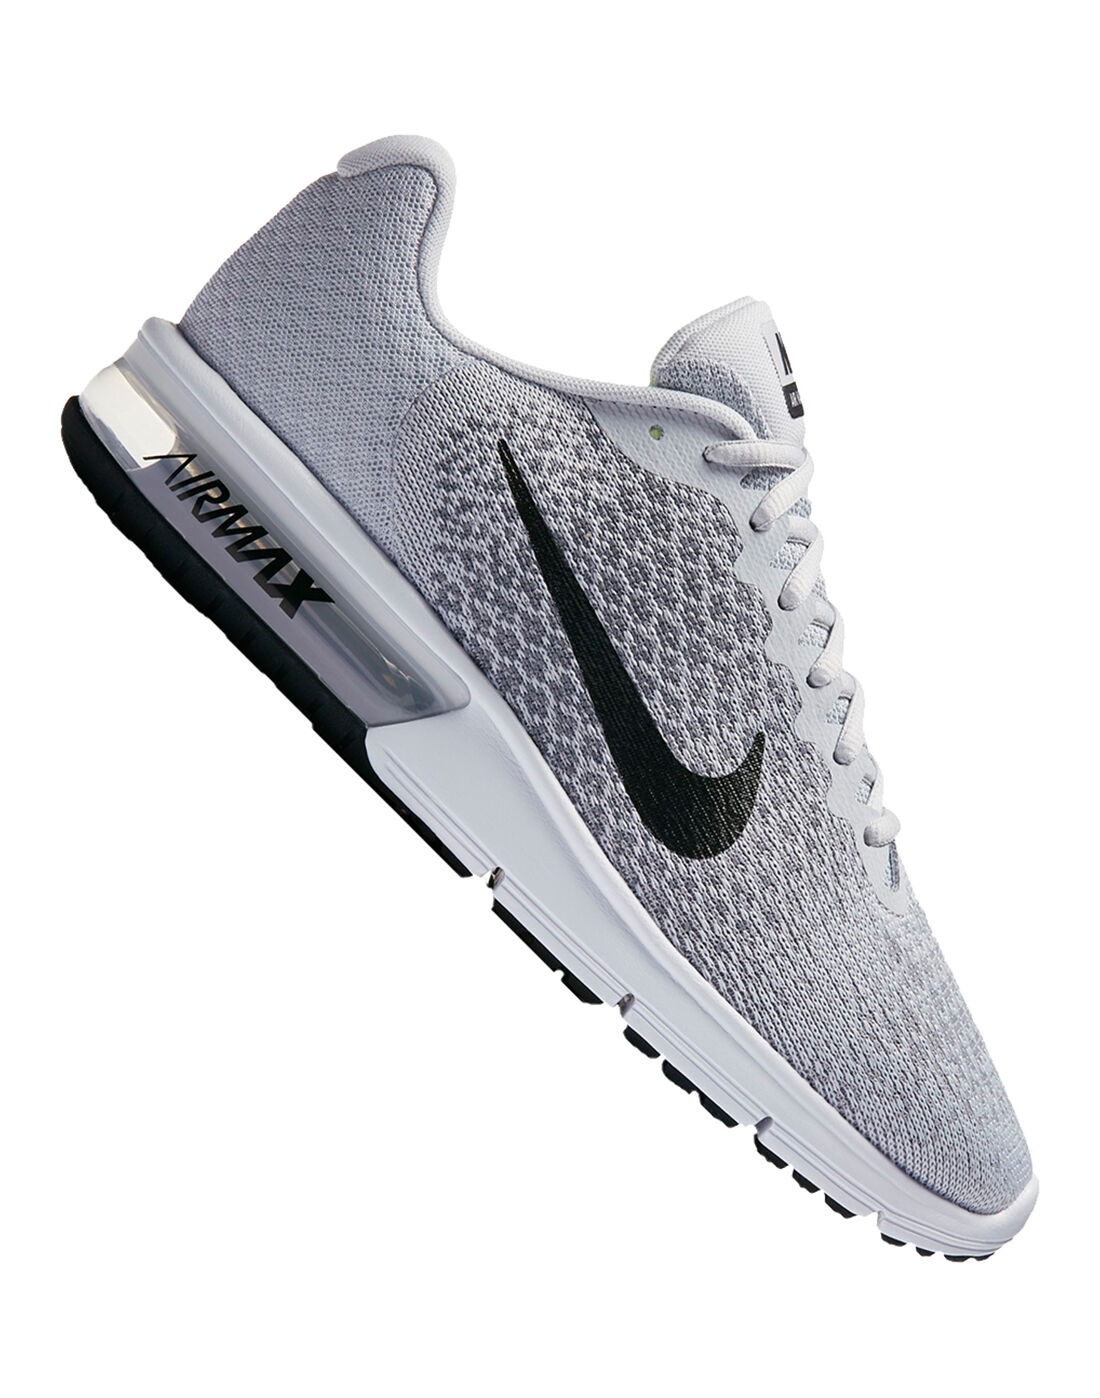 Nike Mens Air Max Sequent 2 - White